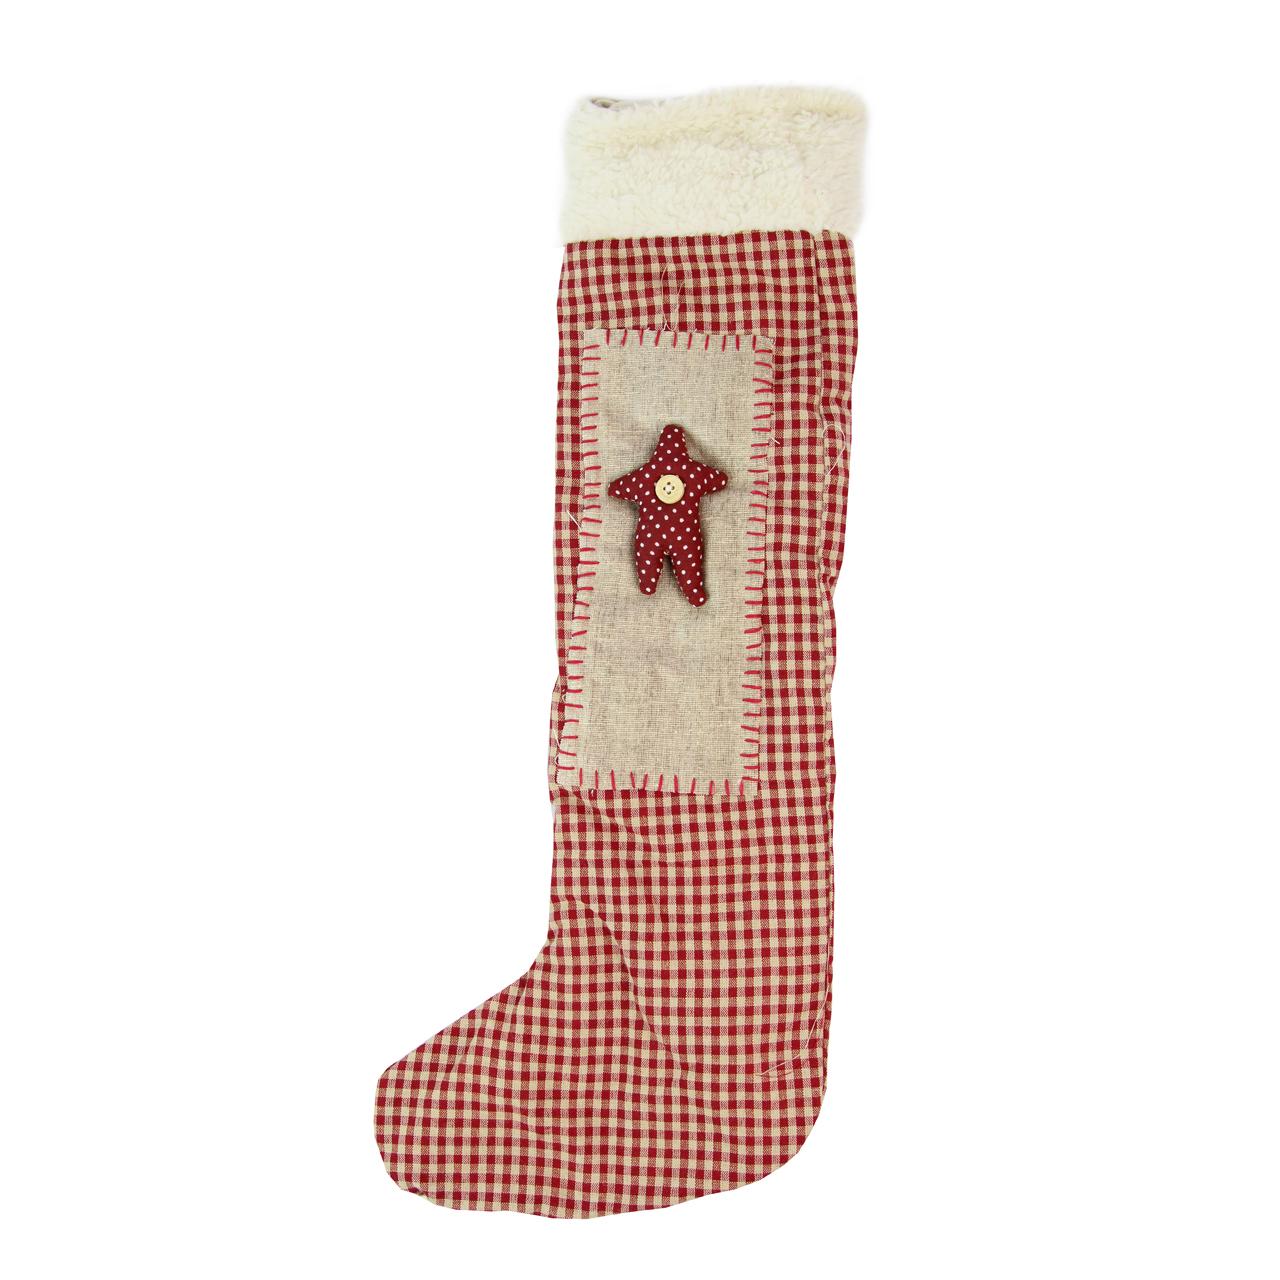 Decoratiune Ciorap Din Textil Bej Cu Rosu Pepit 45 Cm